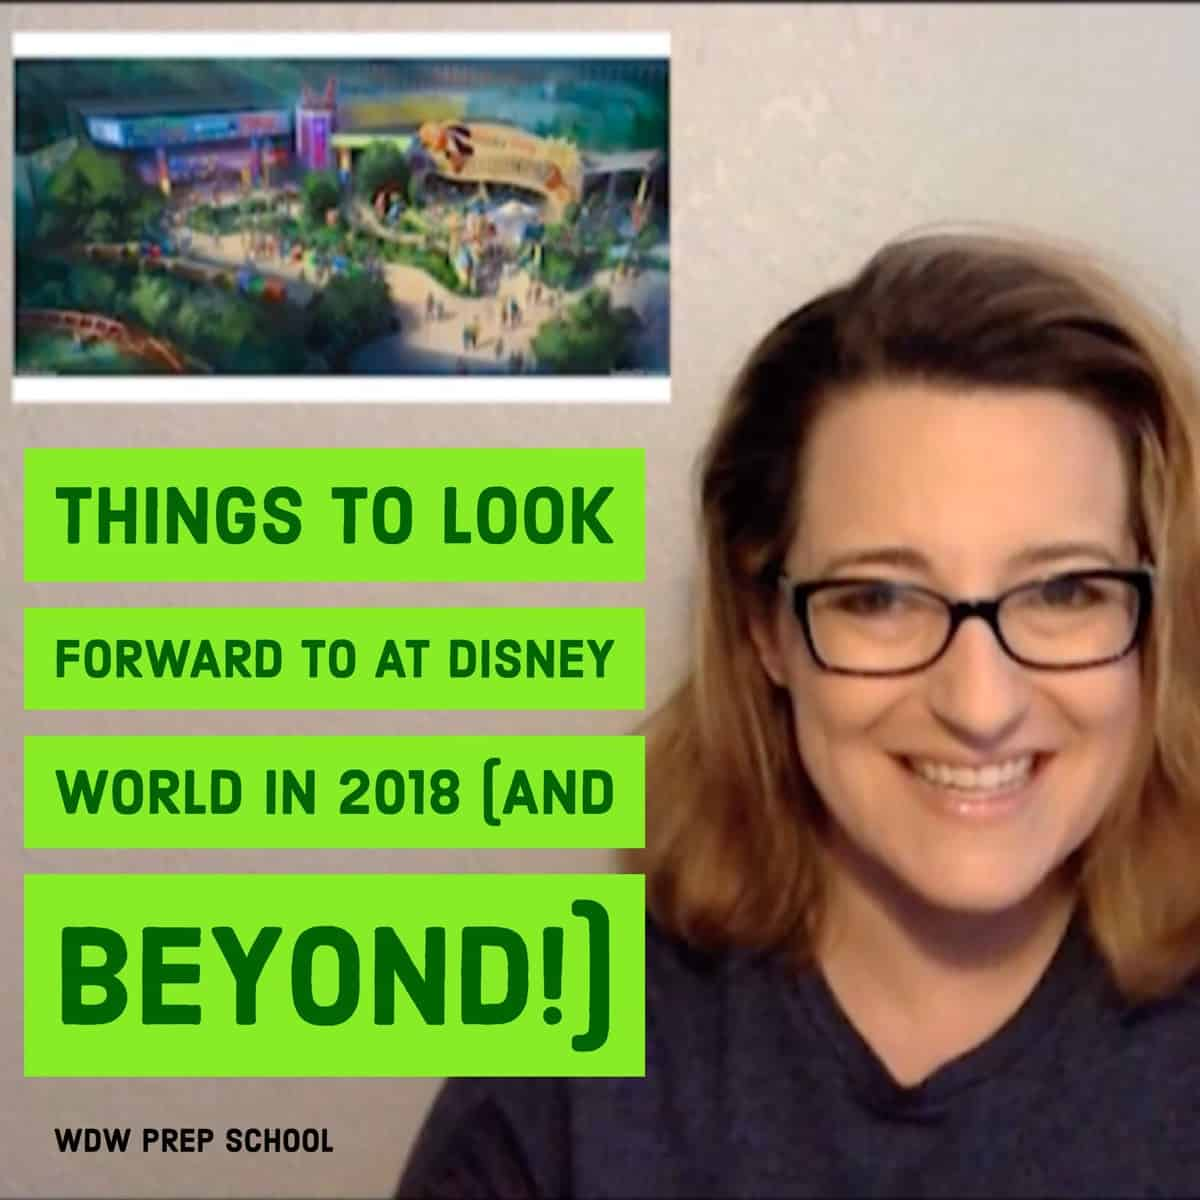 Things to look forward to at Disney World